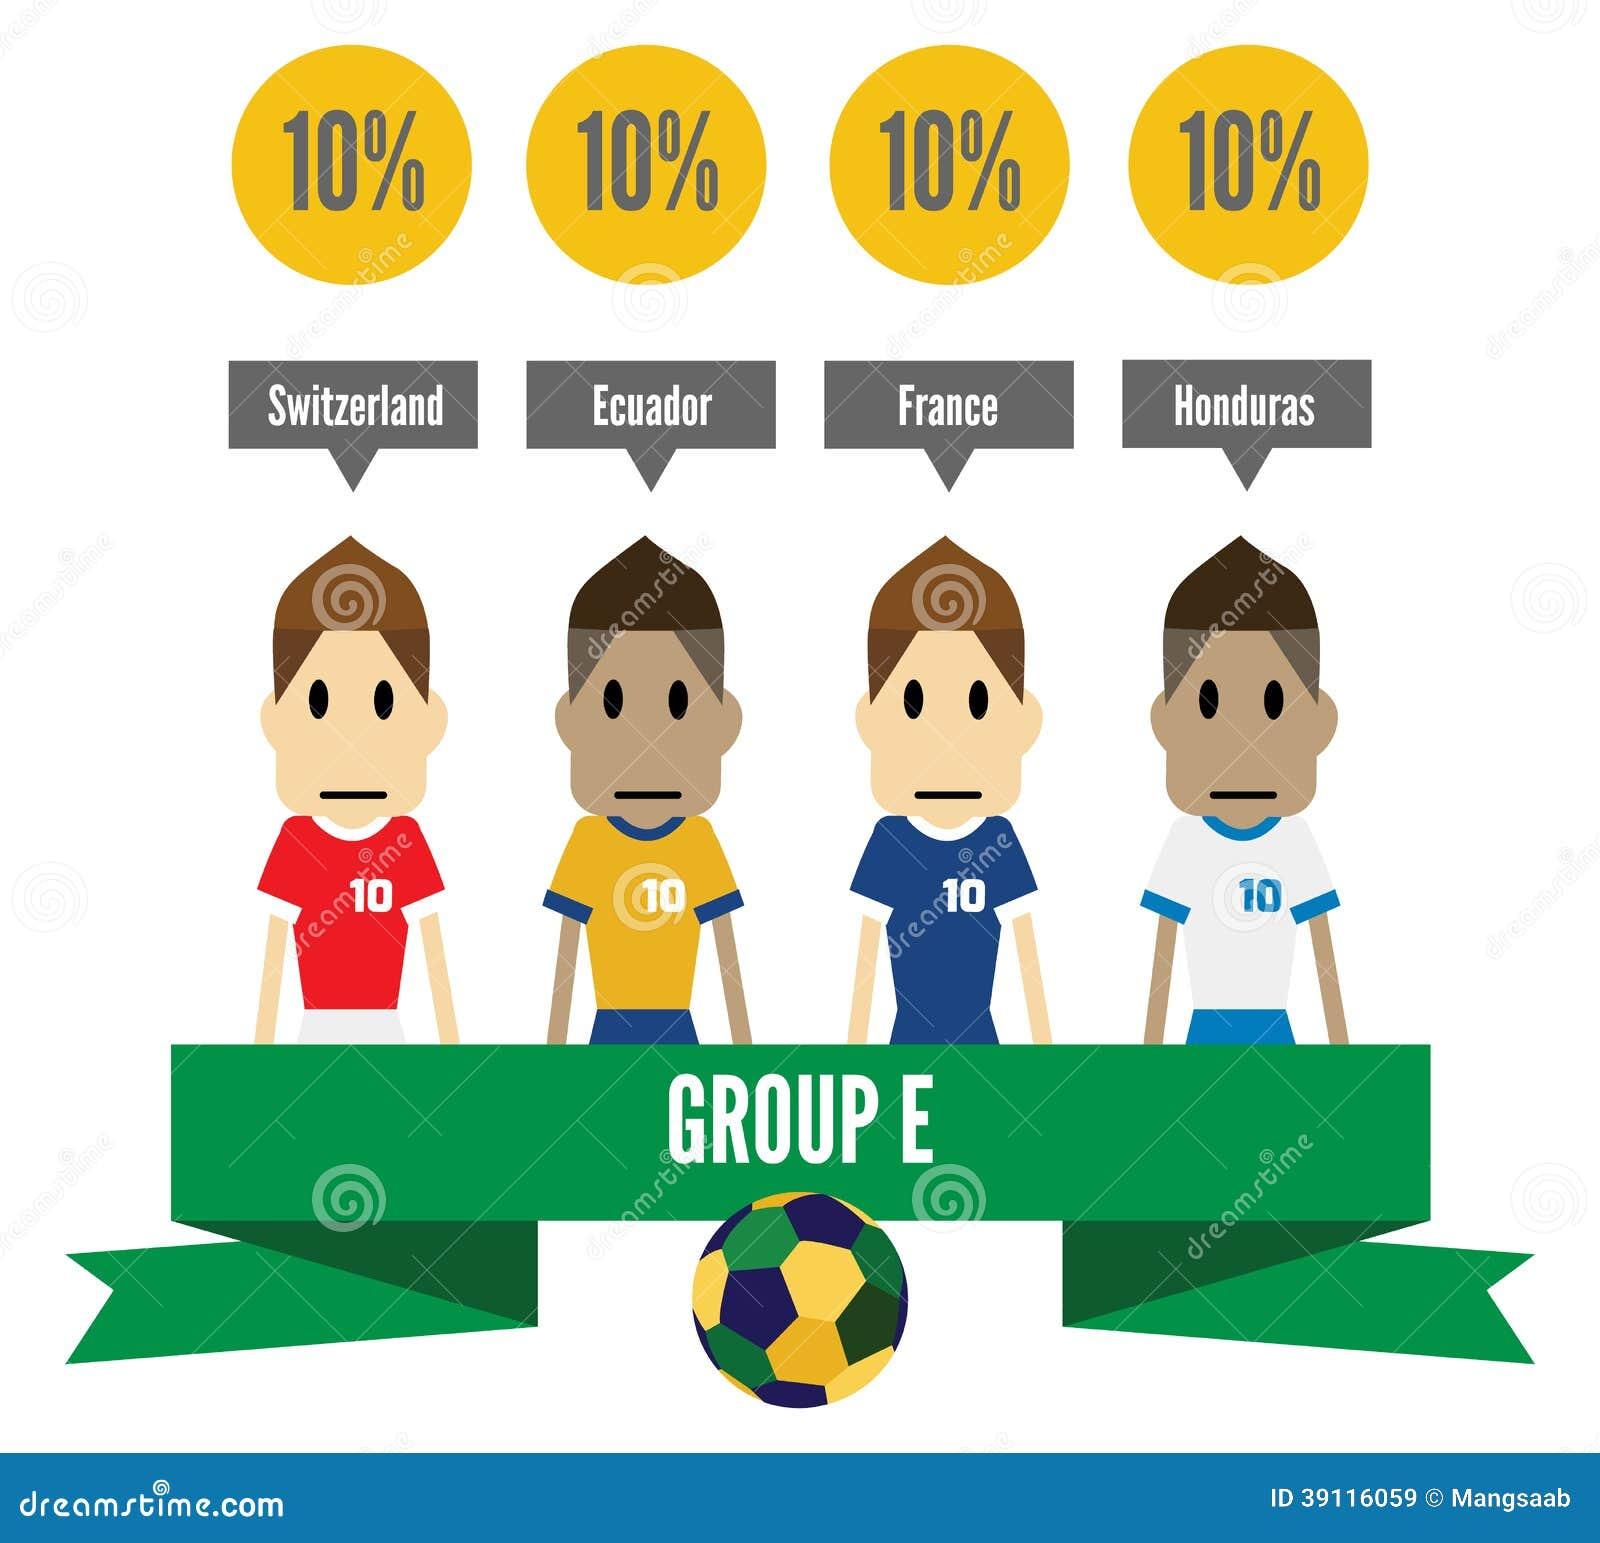 De Groep E van Brazilië 2014